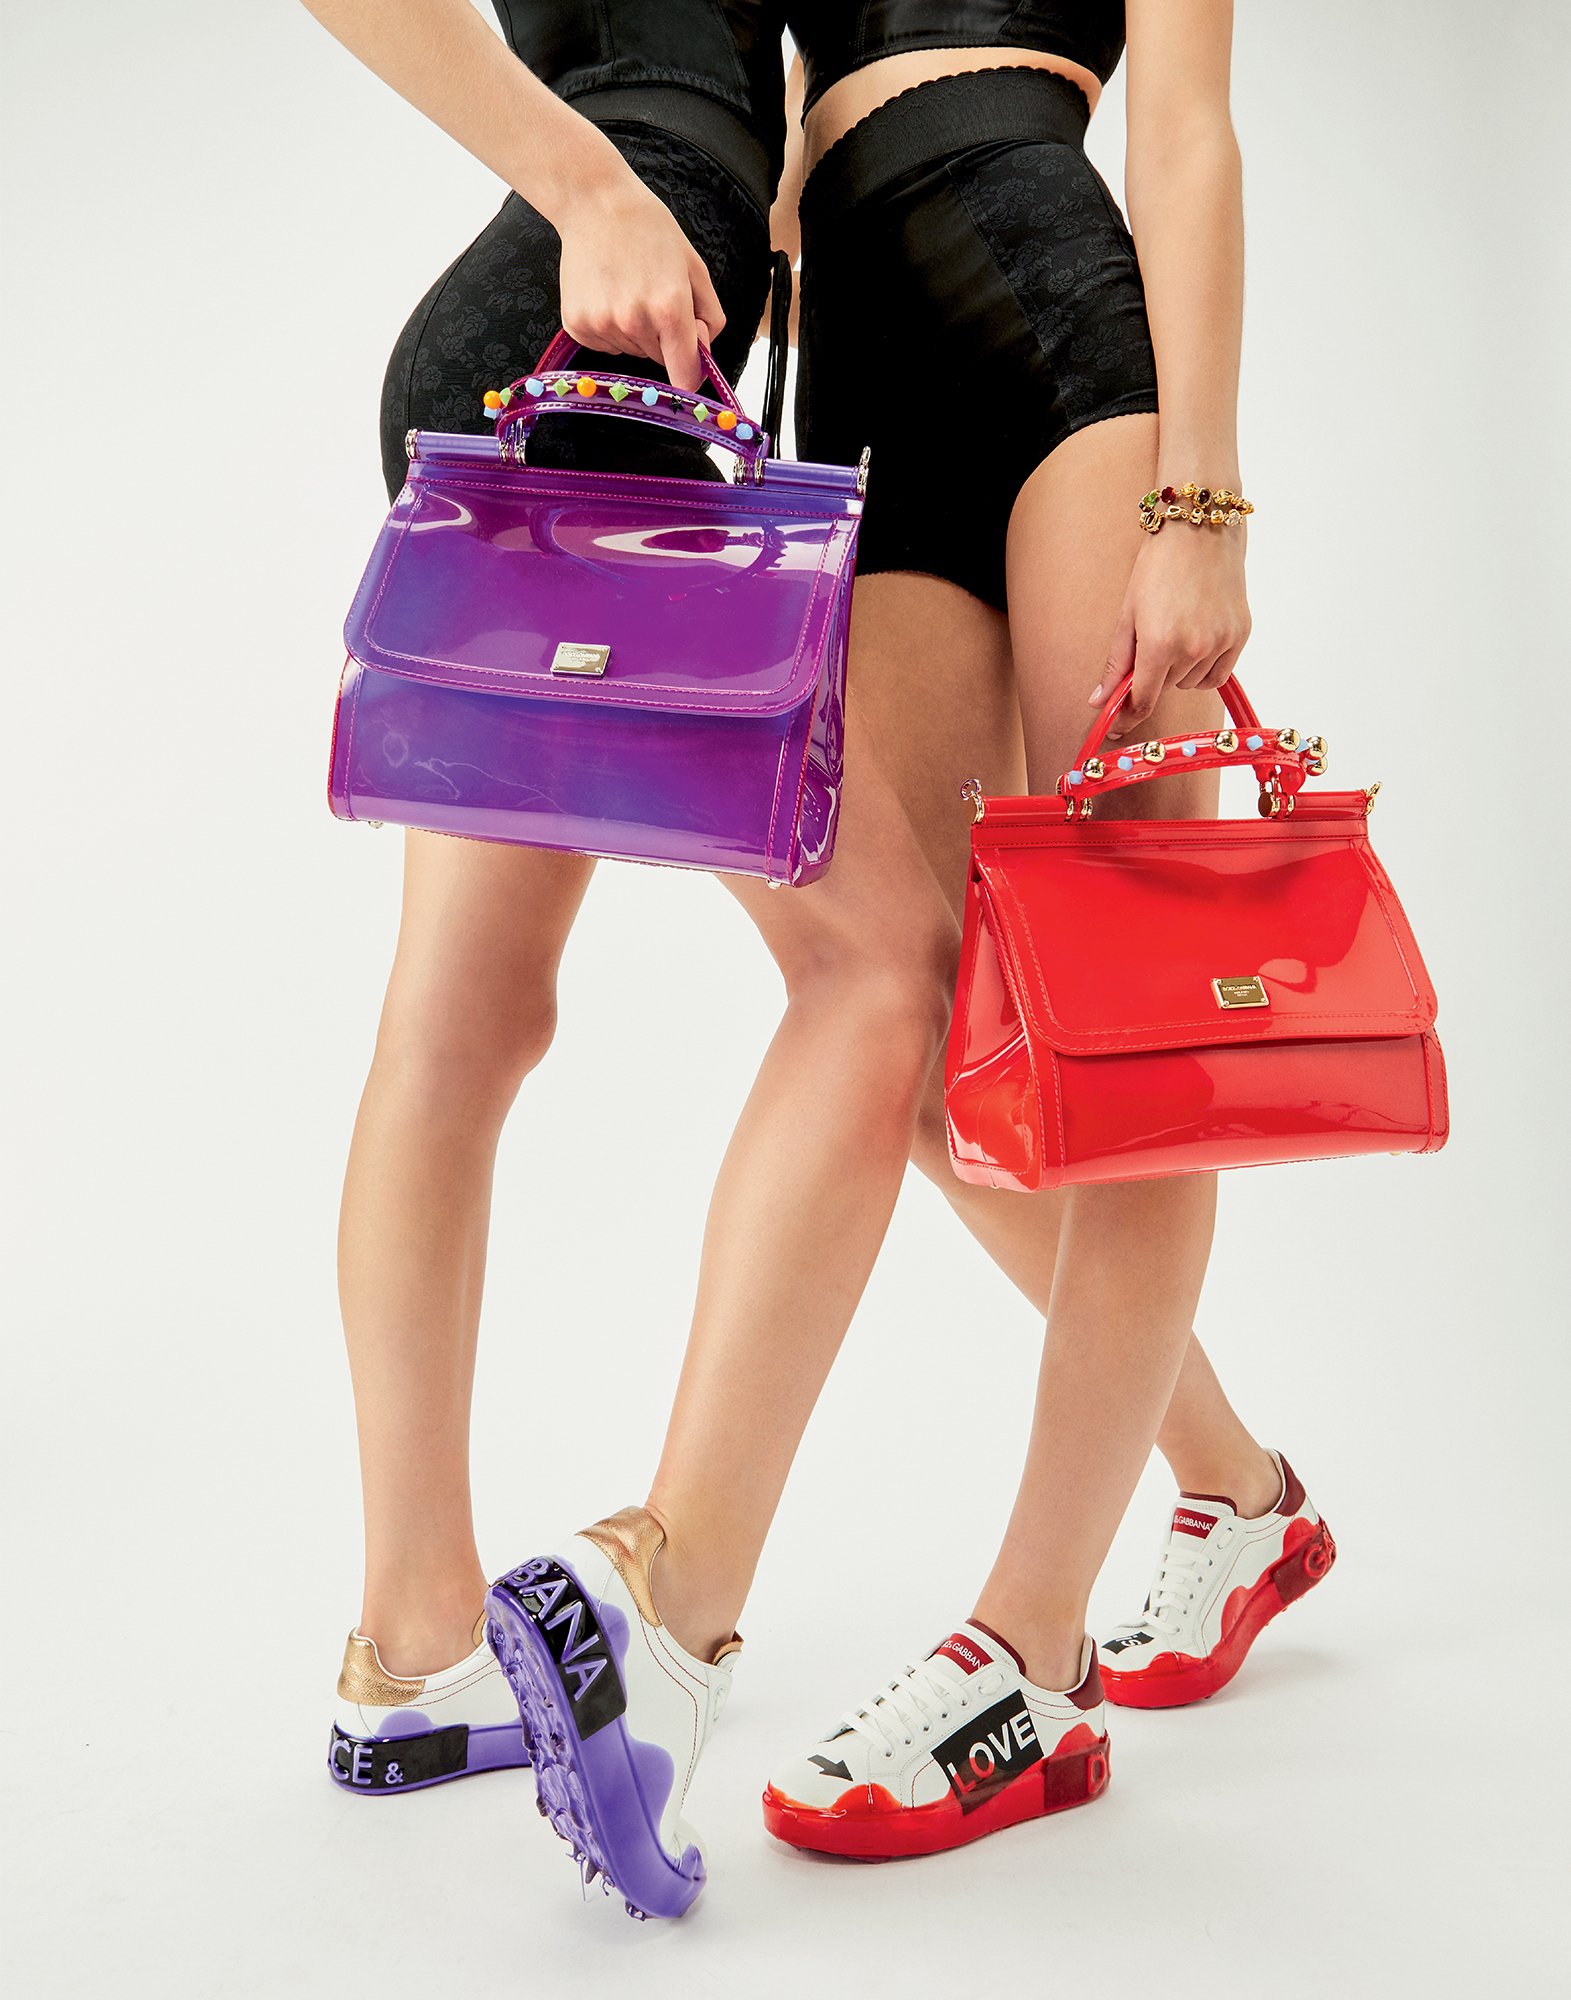 Dolce & Gabbana PORTOFINO MELT SNEAKERS IN PRINTED NAPPA CALFSKIN